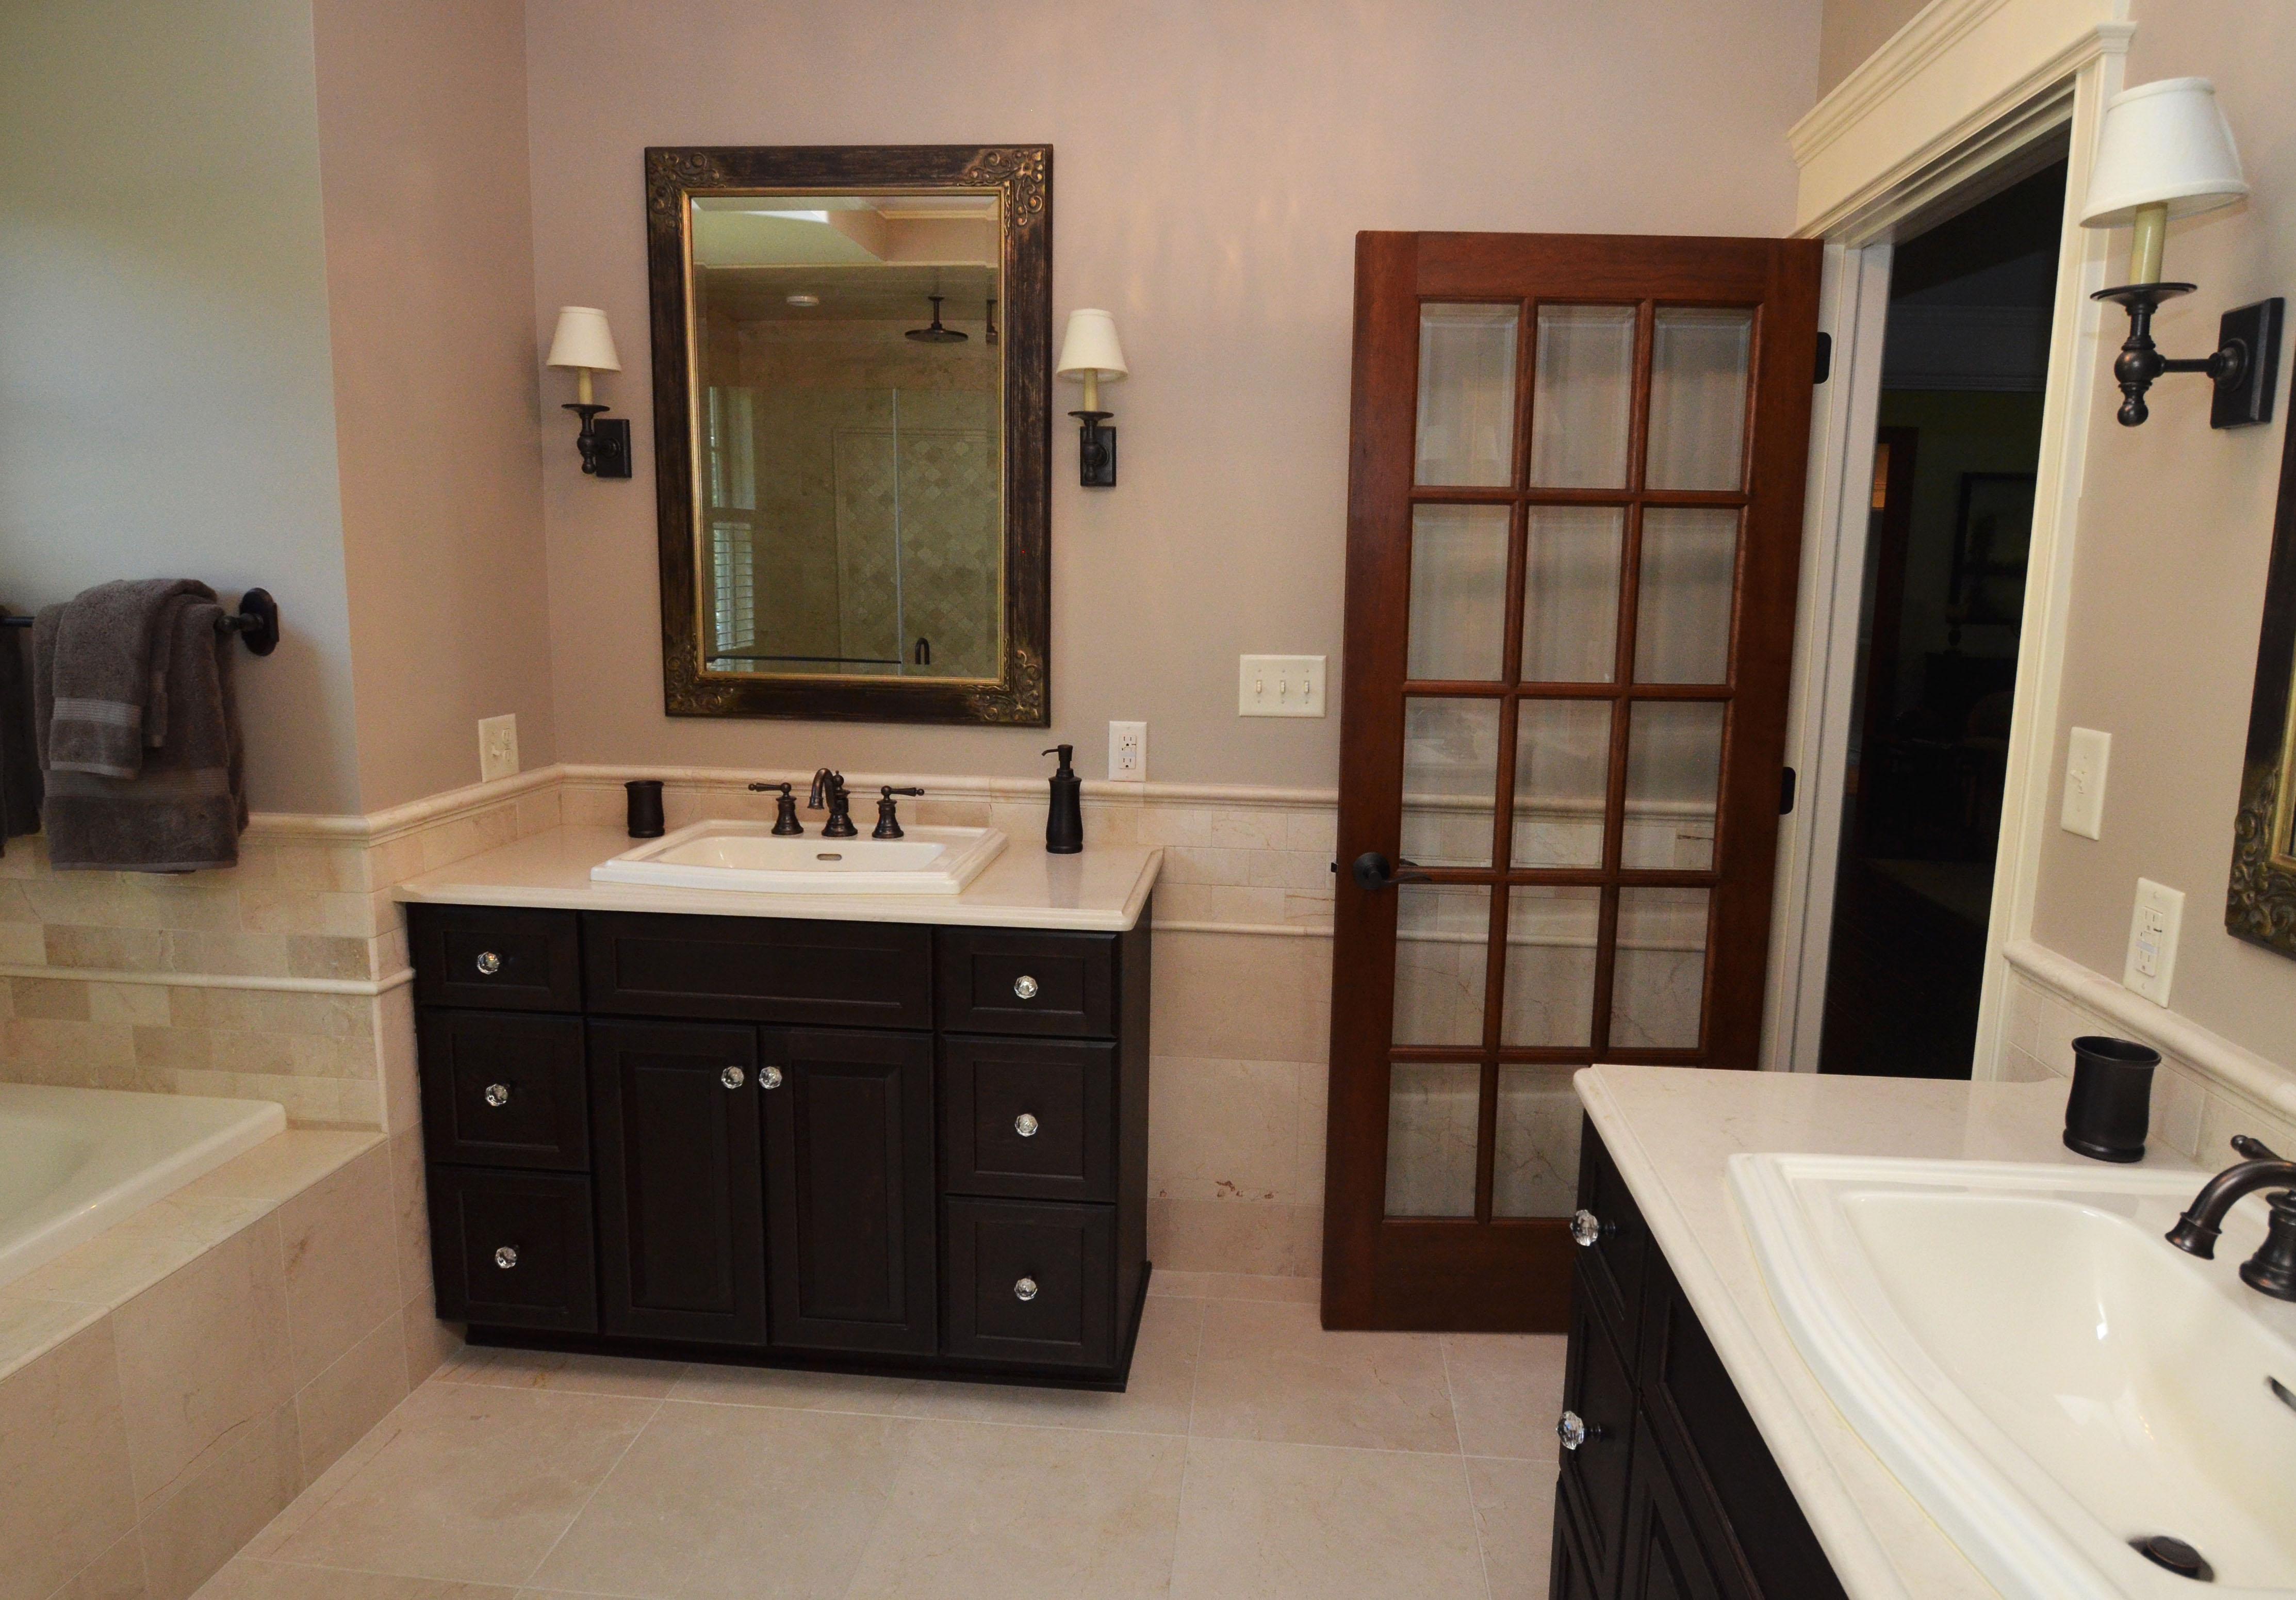 Bathroom Vanity Caesarstone Countertop - Italian Marble & Granite Inc.